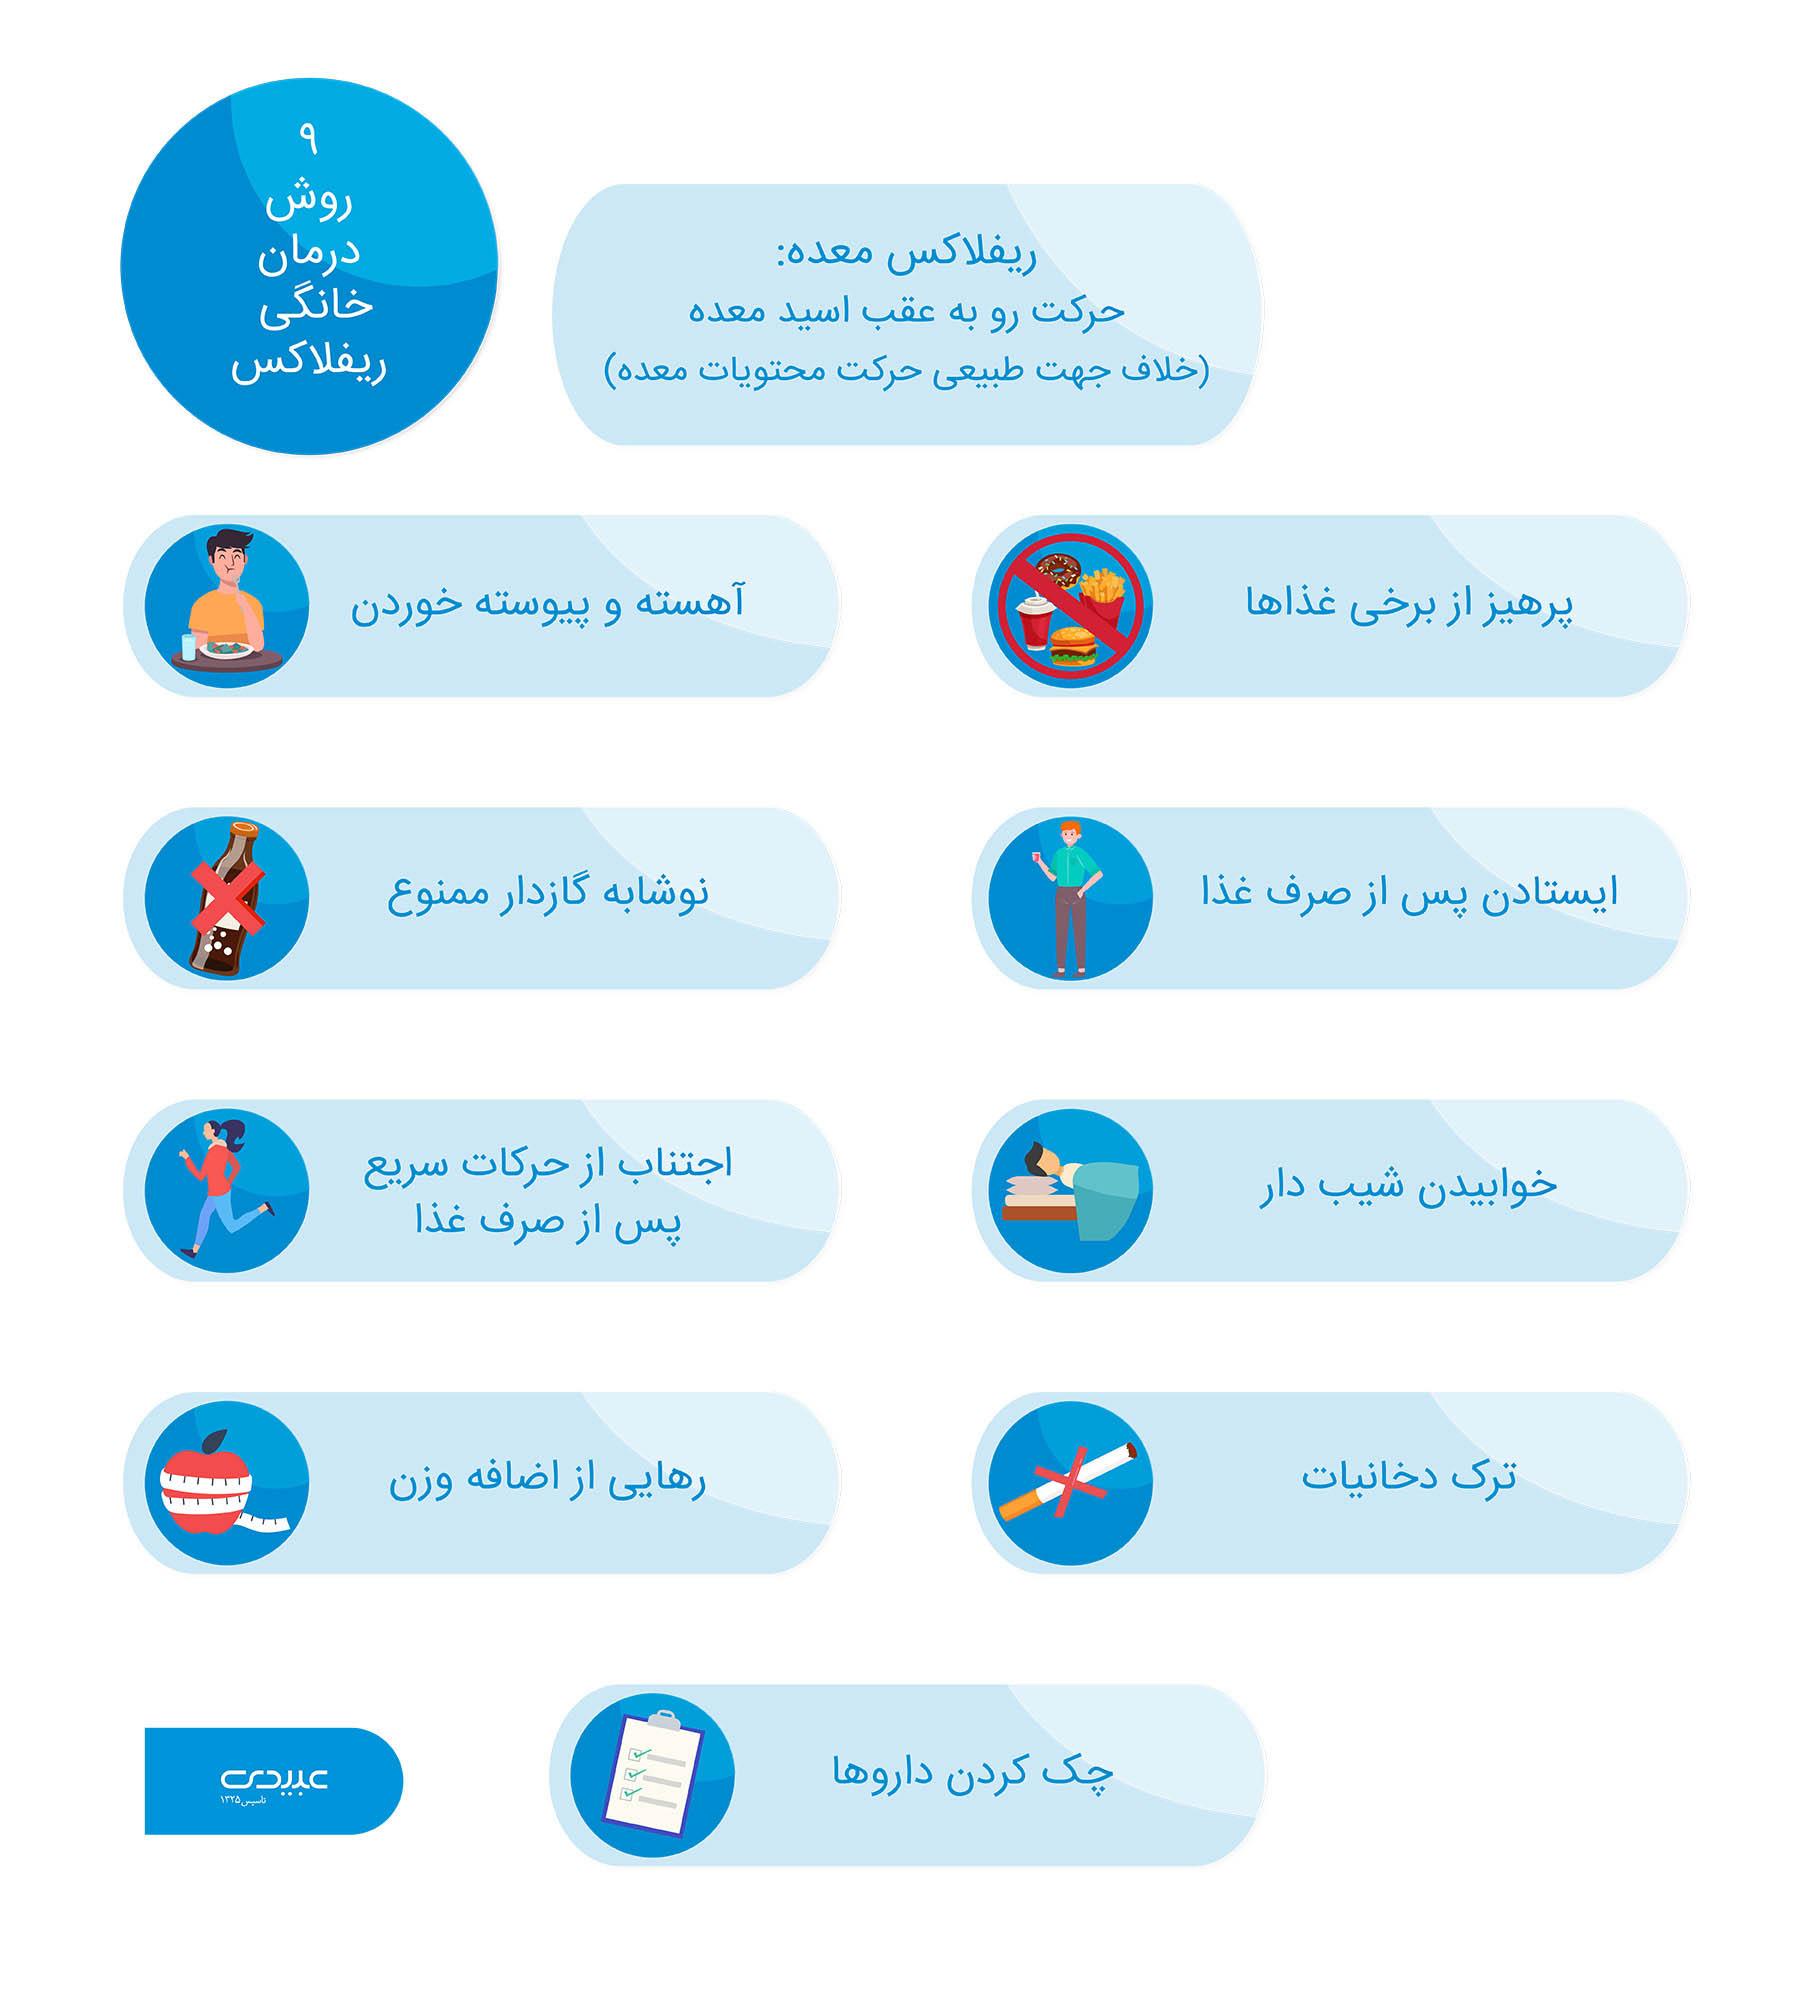 Dr.Abidi-Gastric reflux treatment methods|روش های بهبود ریفلاکس معده